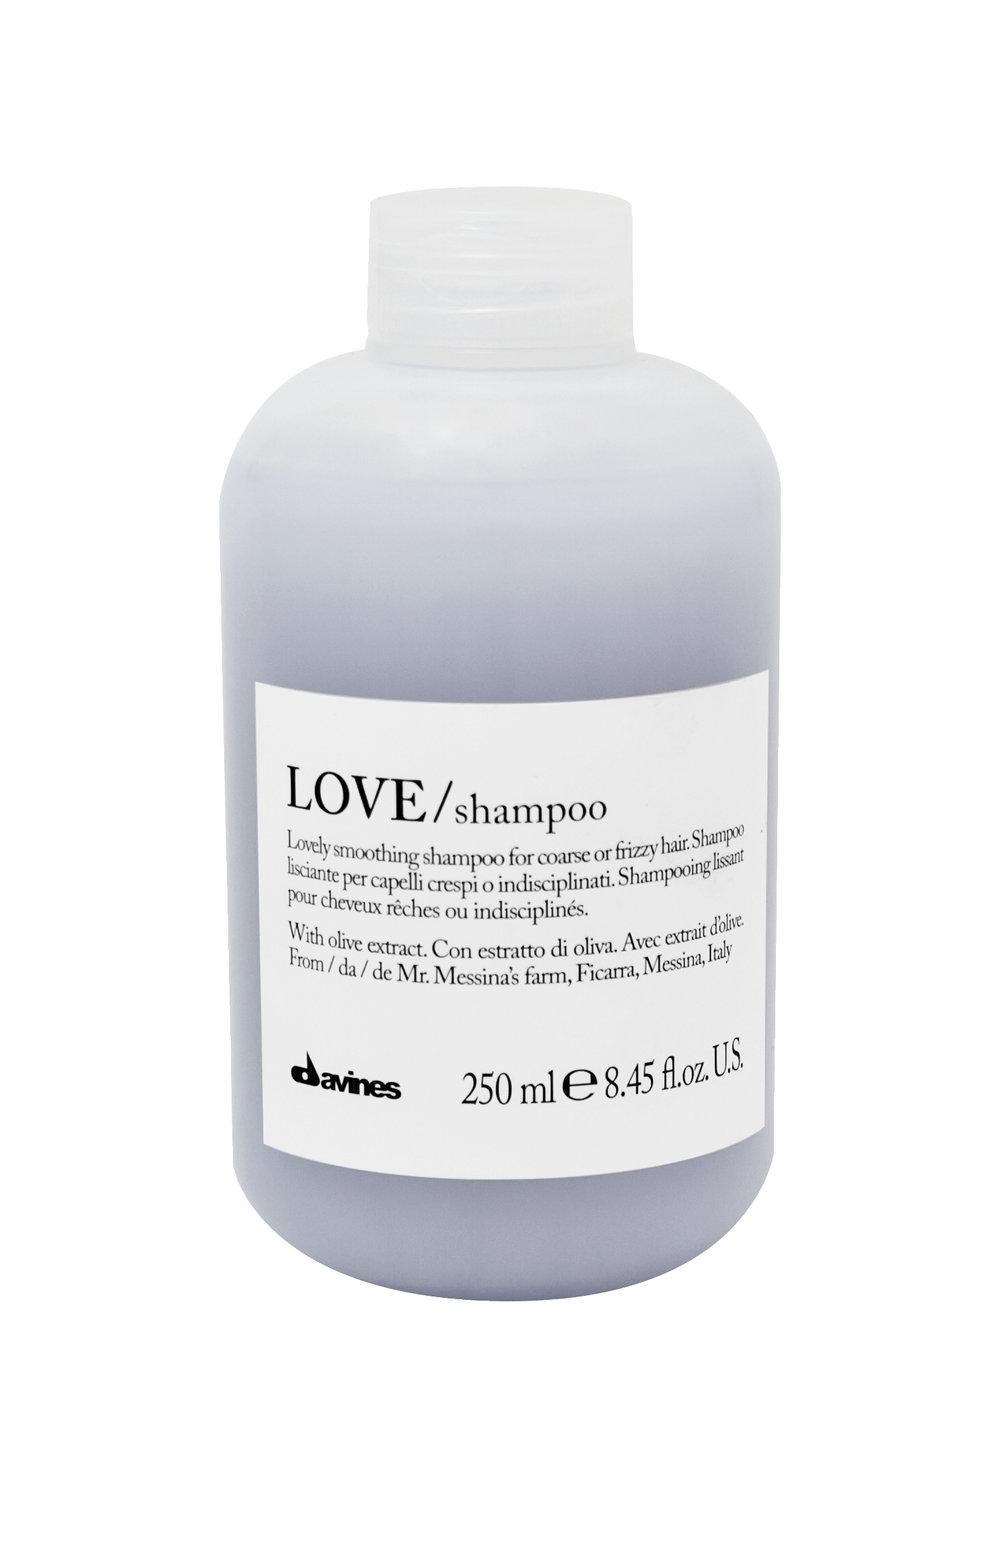 ech love smoothing shampoo.jpg